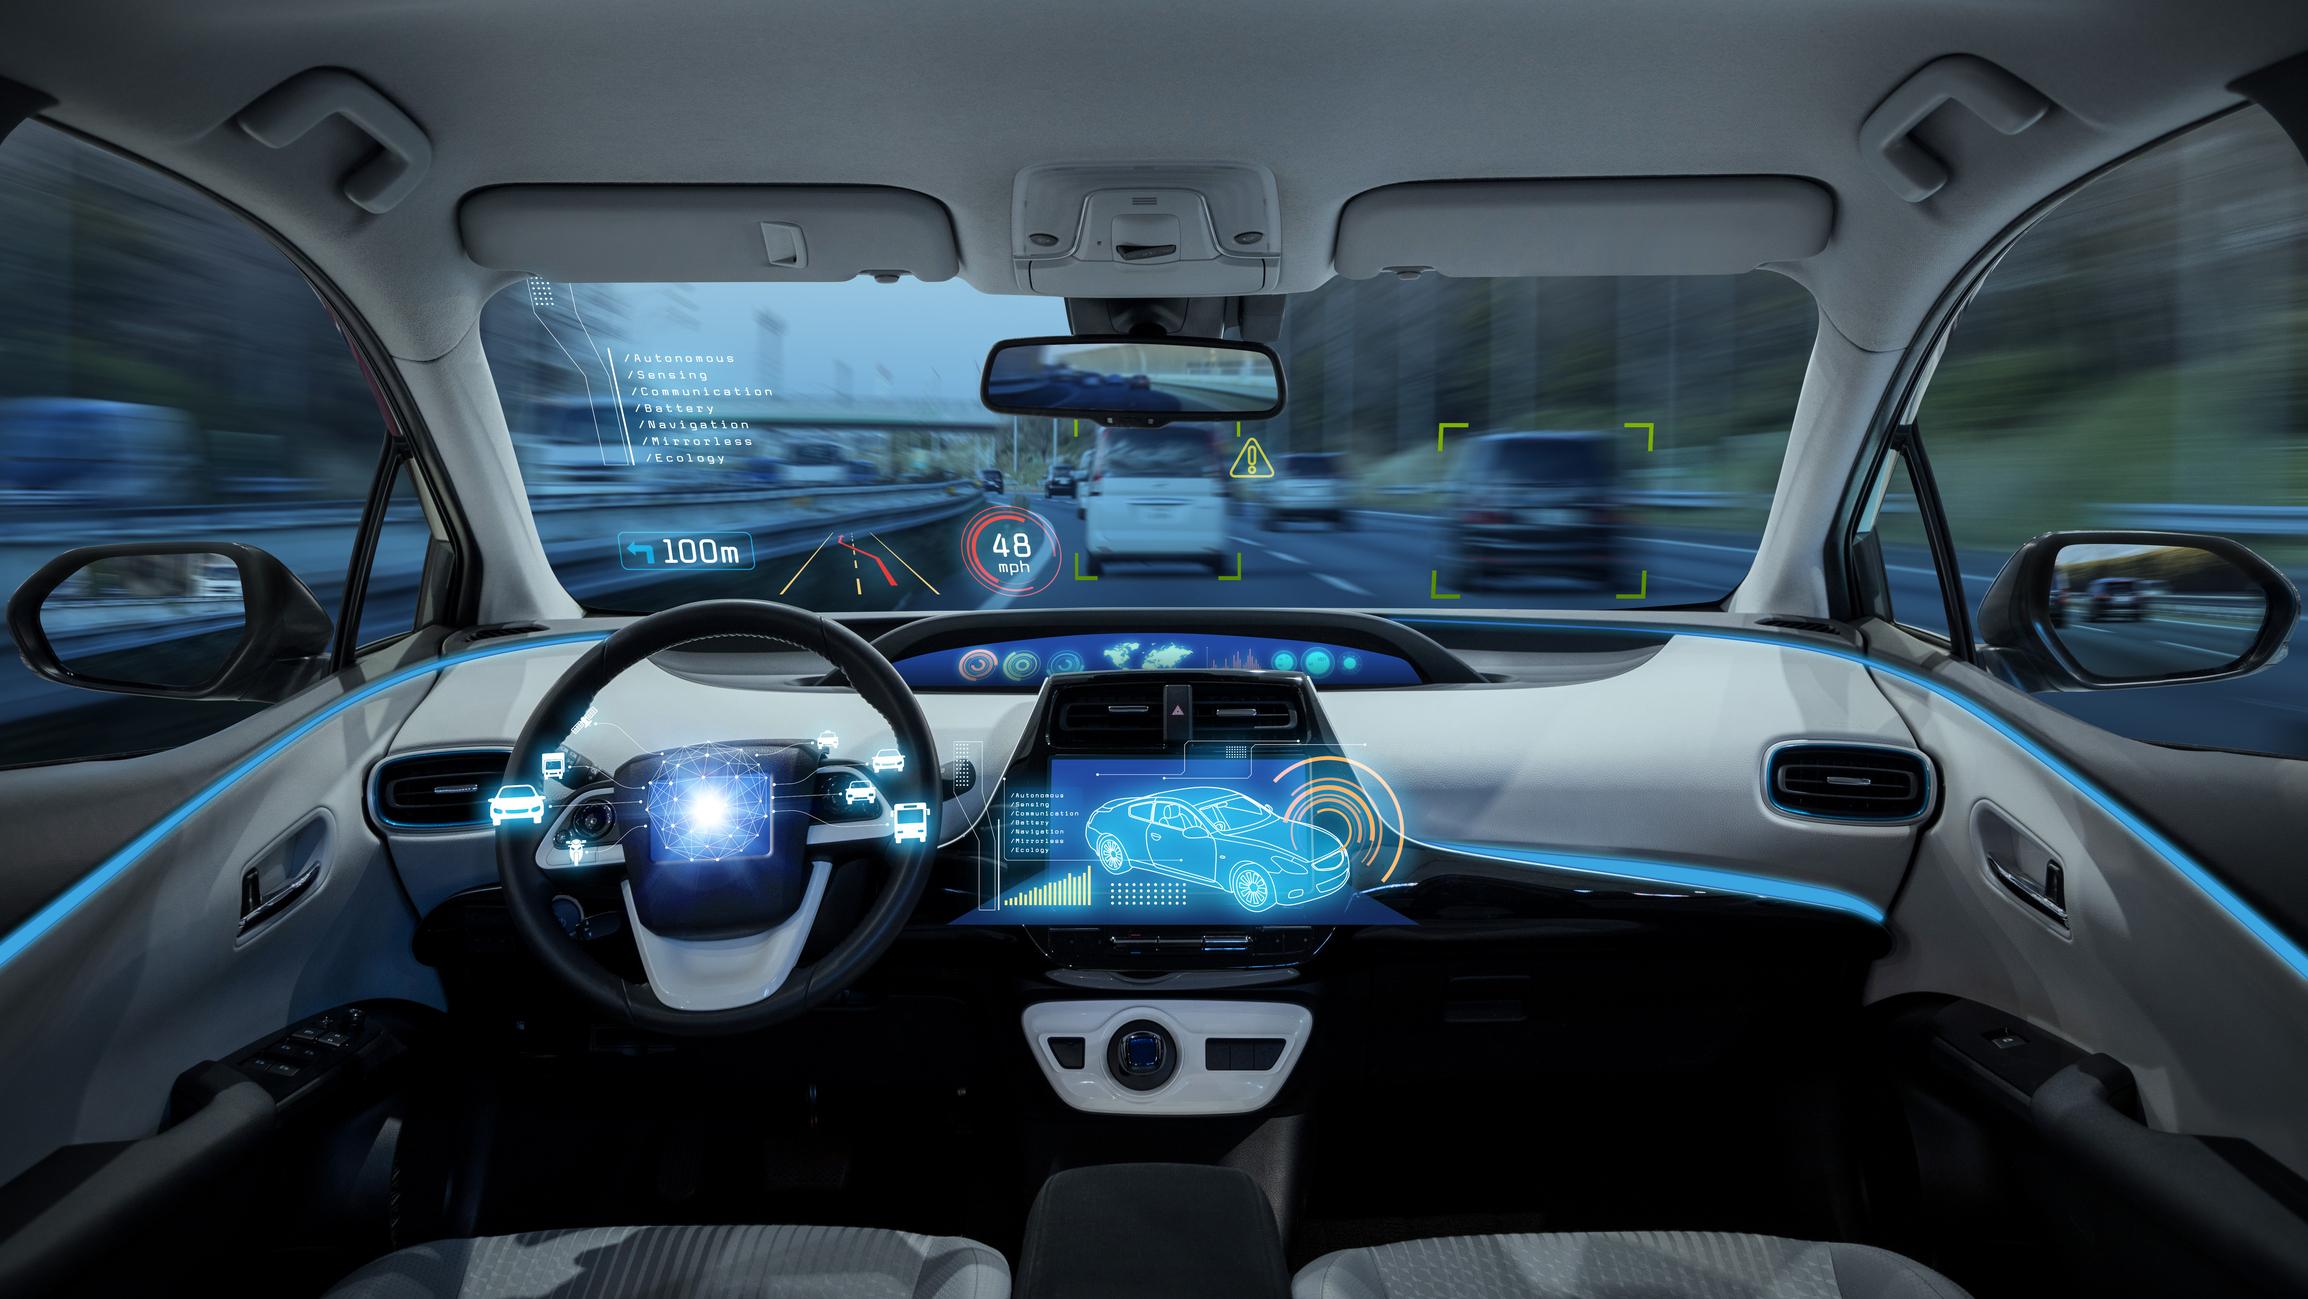 The interior of a smart car.